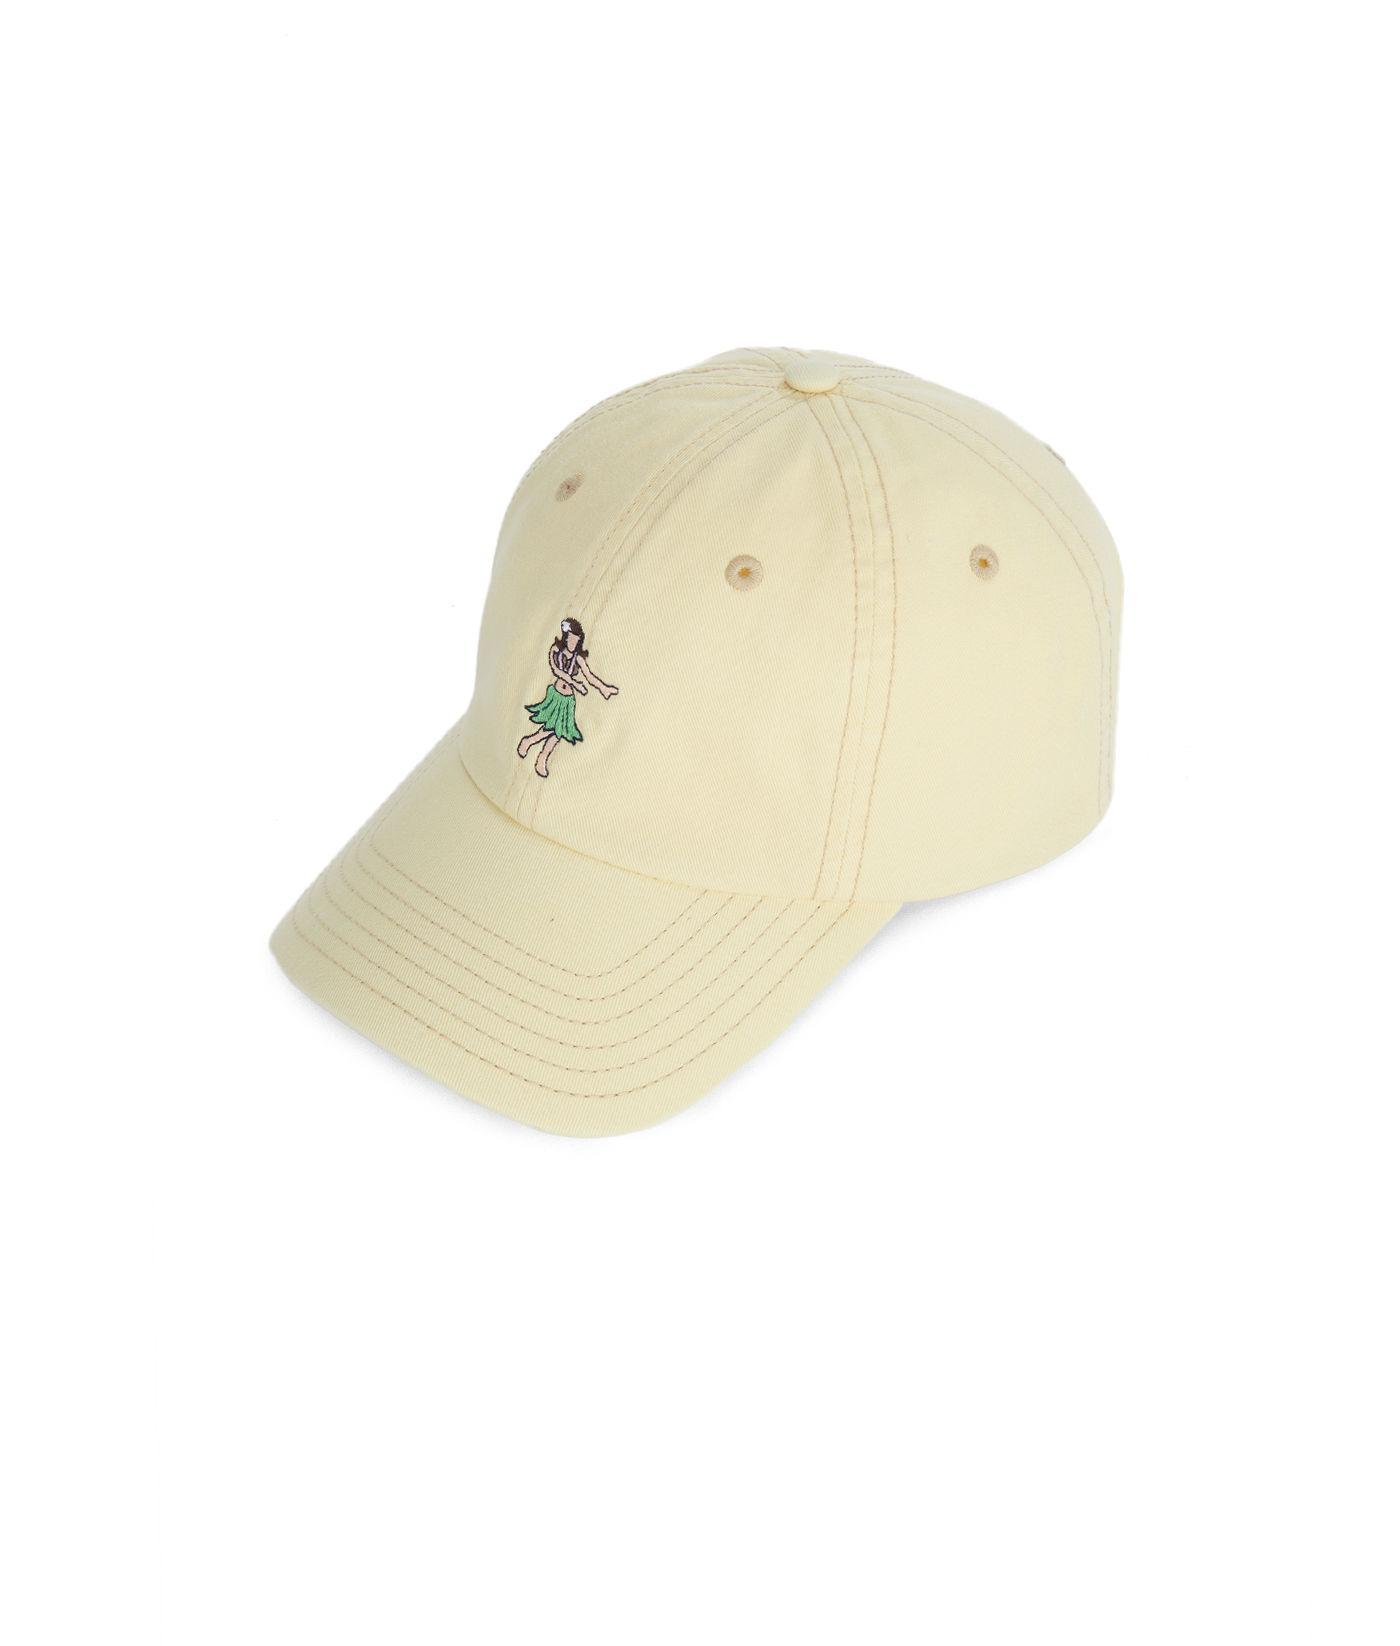 Vineyard Vines - Natural Hula Girl Classic Twill Hat for Men - Lyst. View  fullscreen c51f57893937